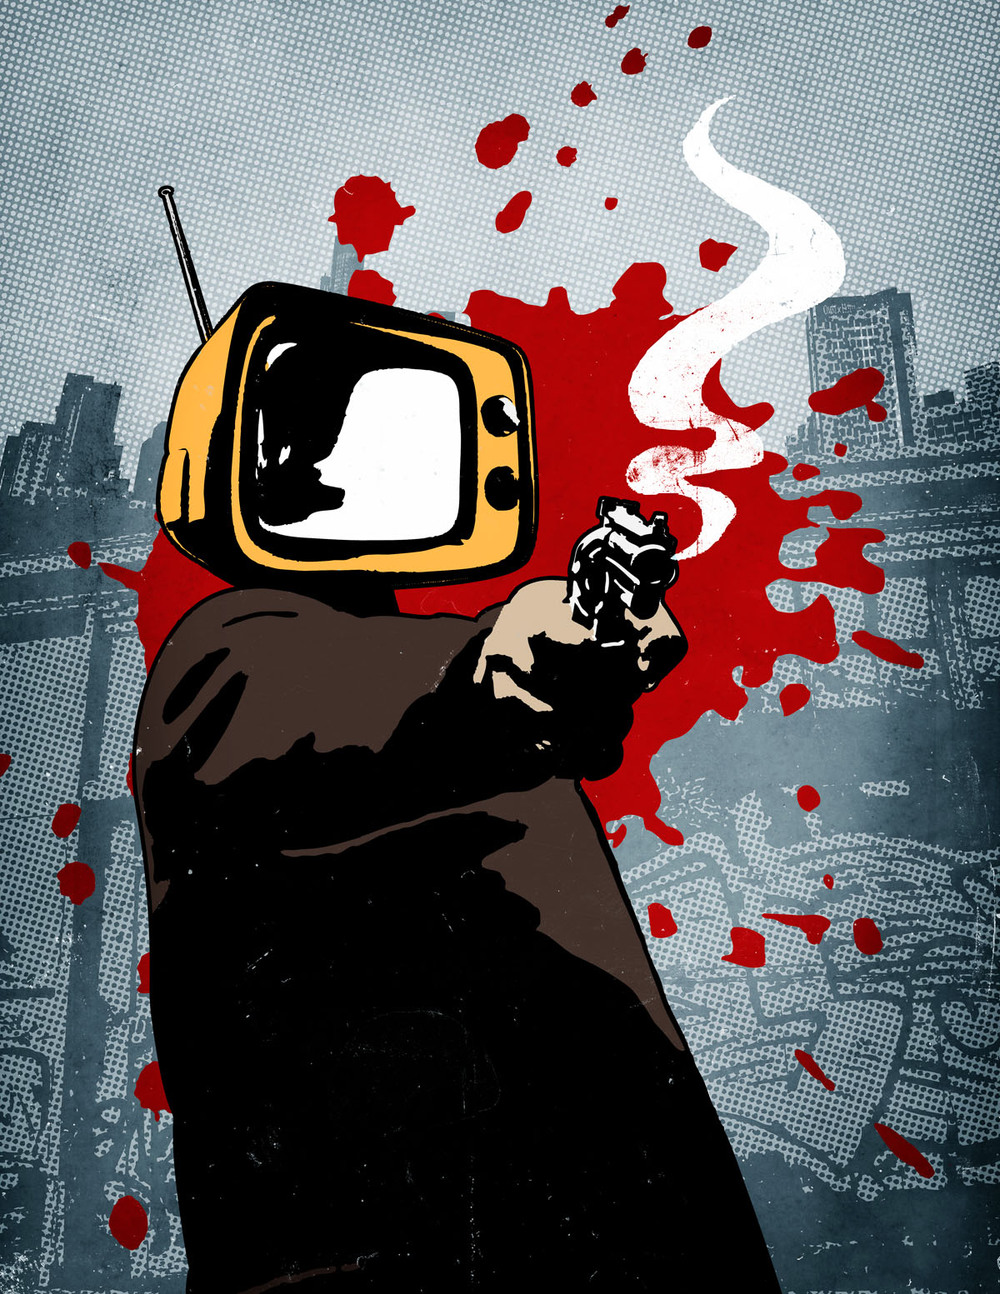 television_violence_03.jpg